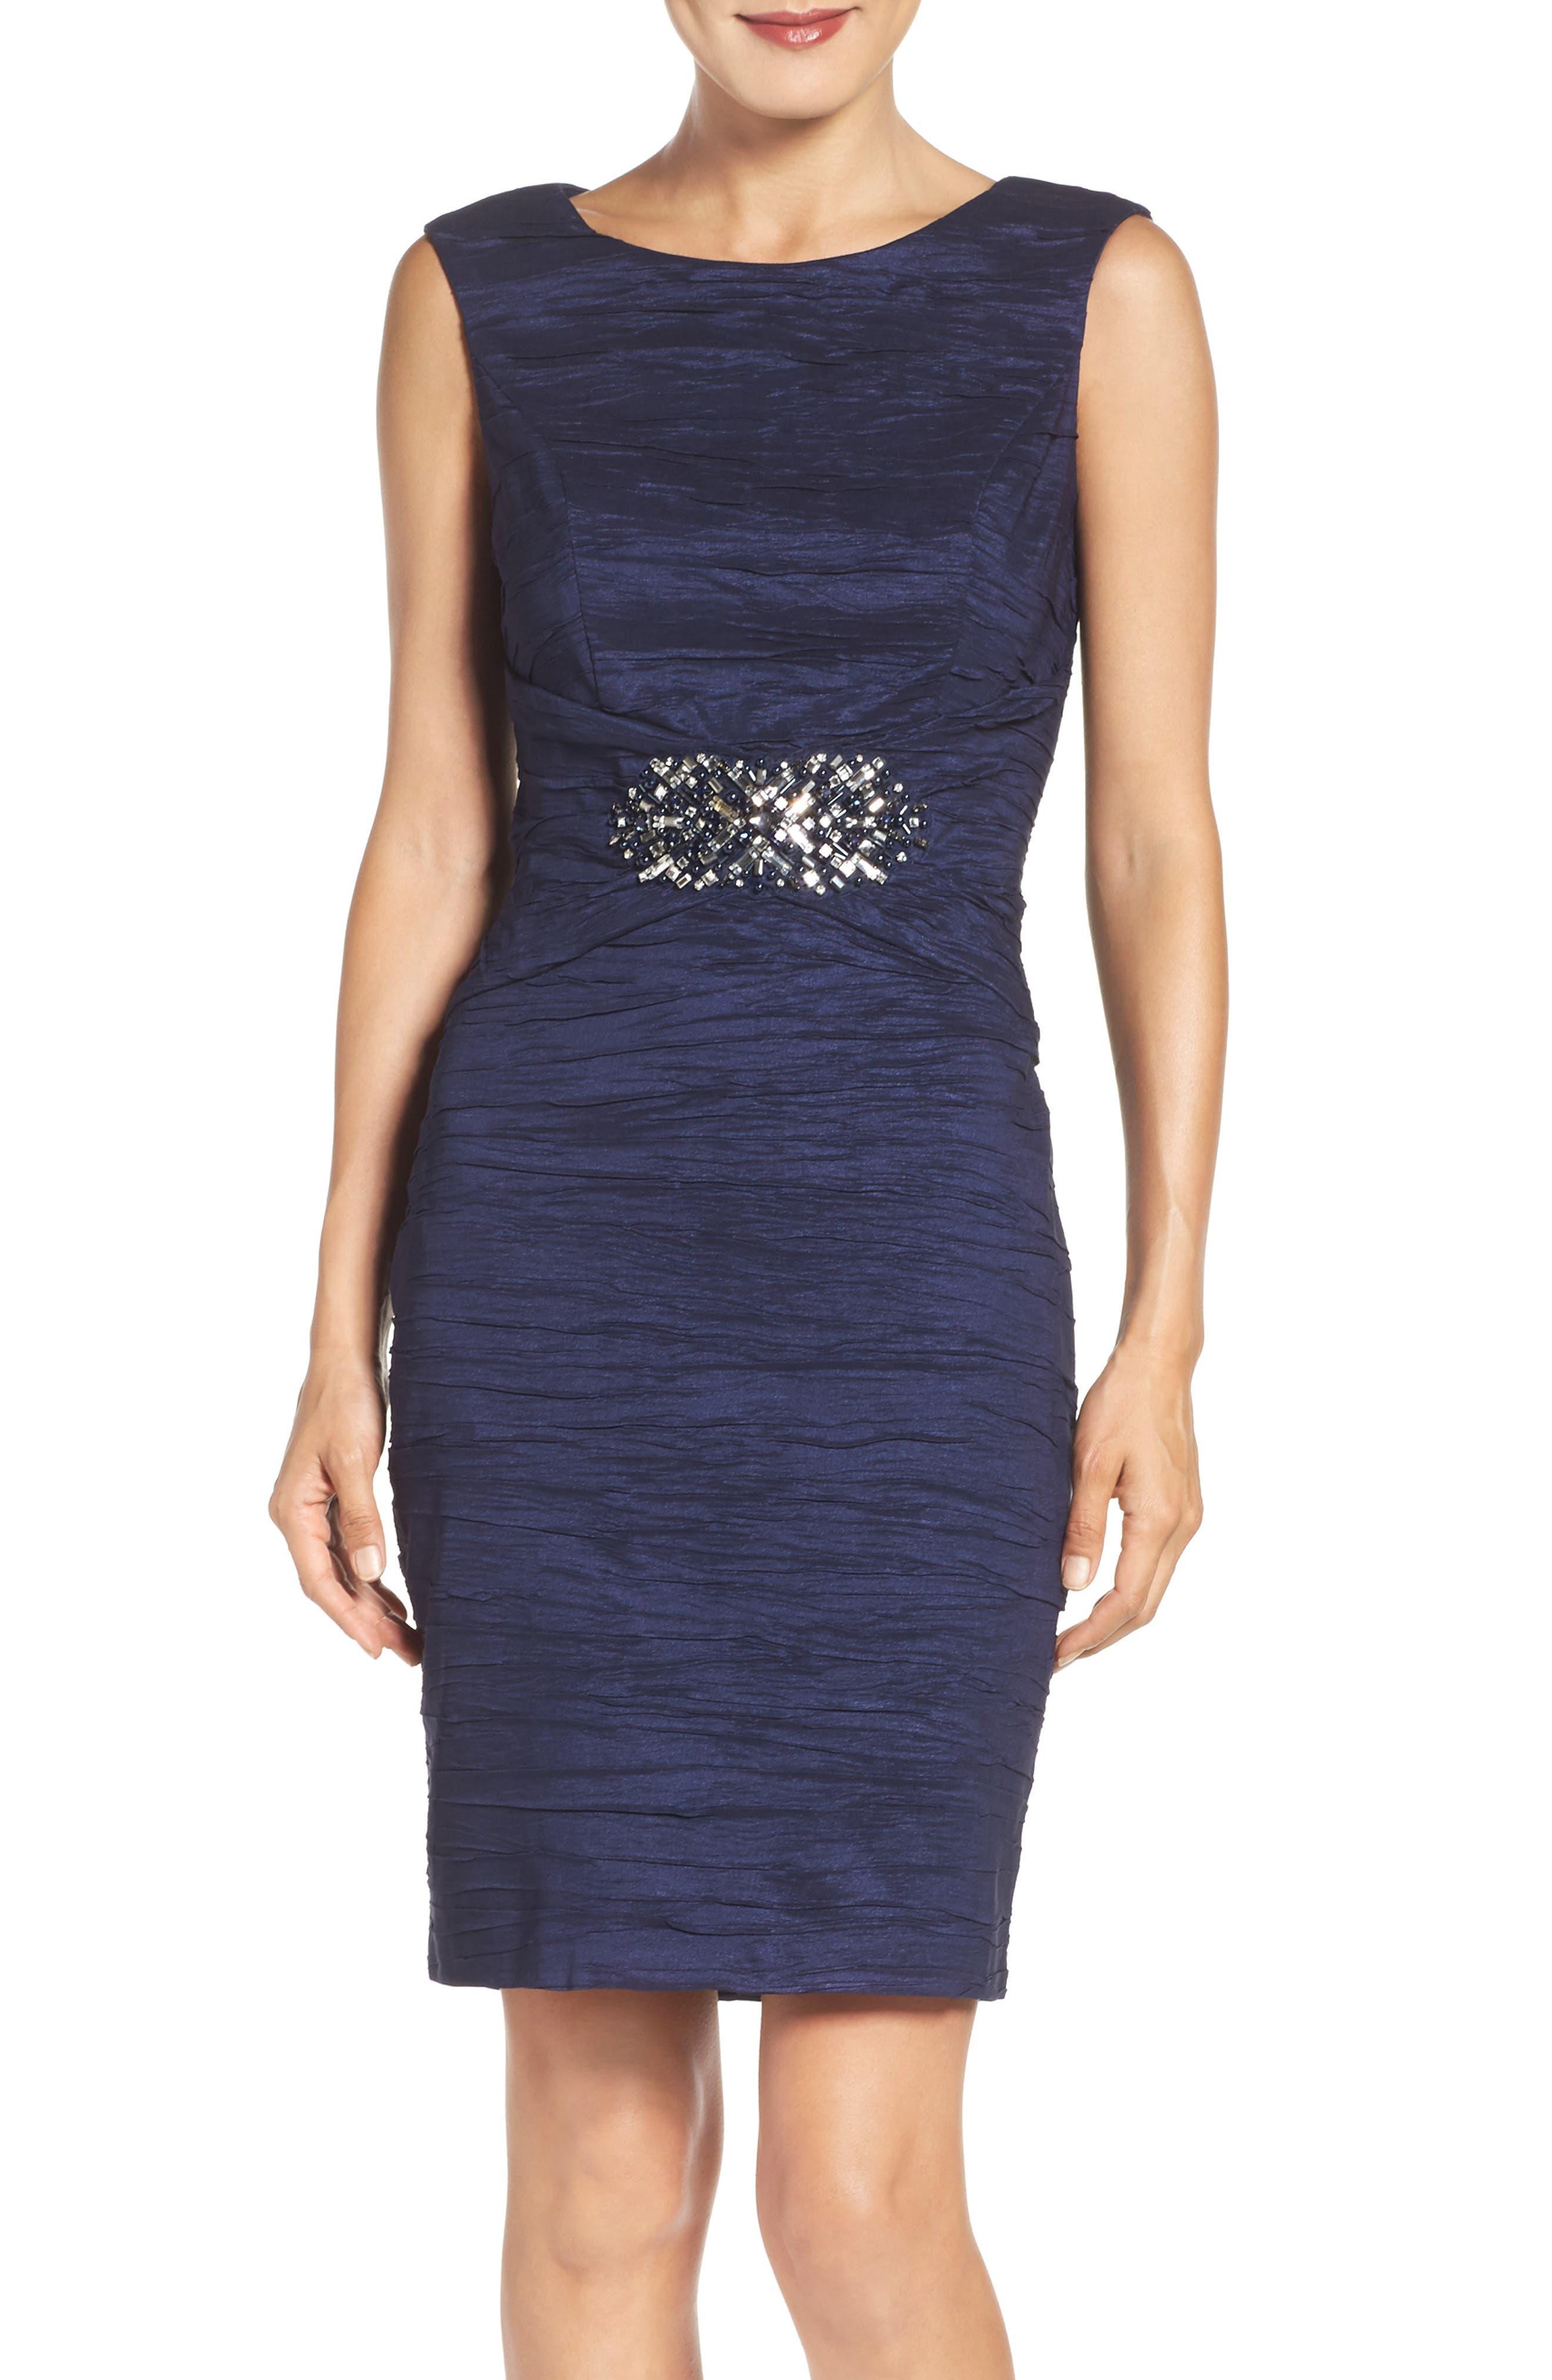 Alternate Image 1 Selected - Eliza J Embellished Taffeta Sheath Dress